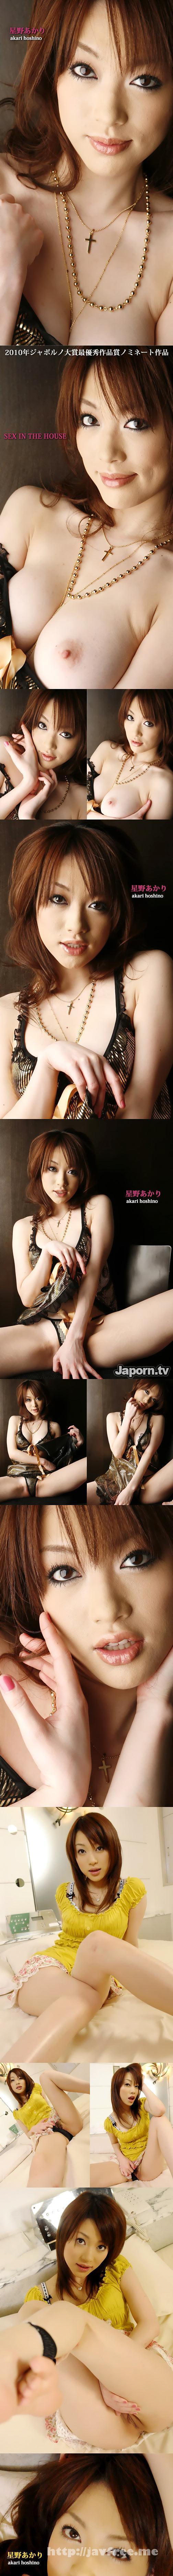 [SSKP 005] サスケプレミアム Vol.5 : 星野あかり 星野あかり SSKP Akari Hoshino